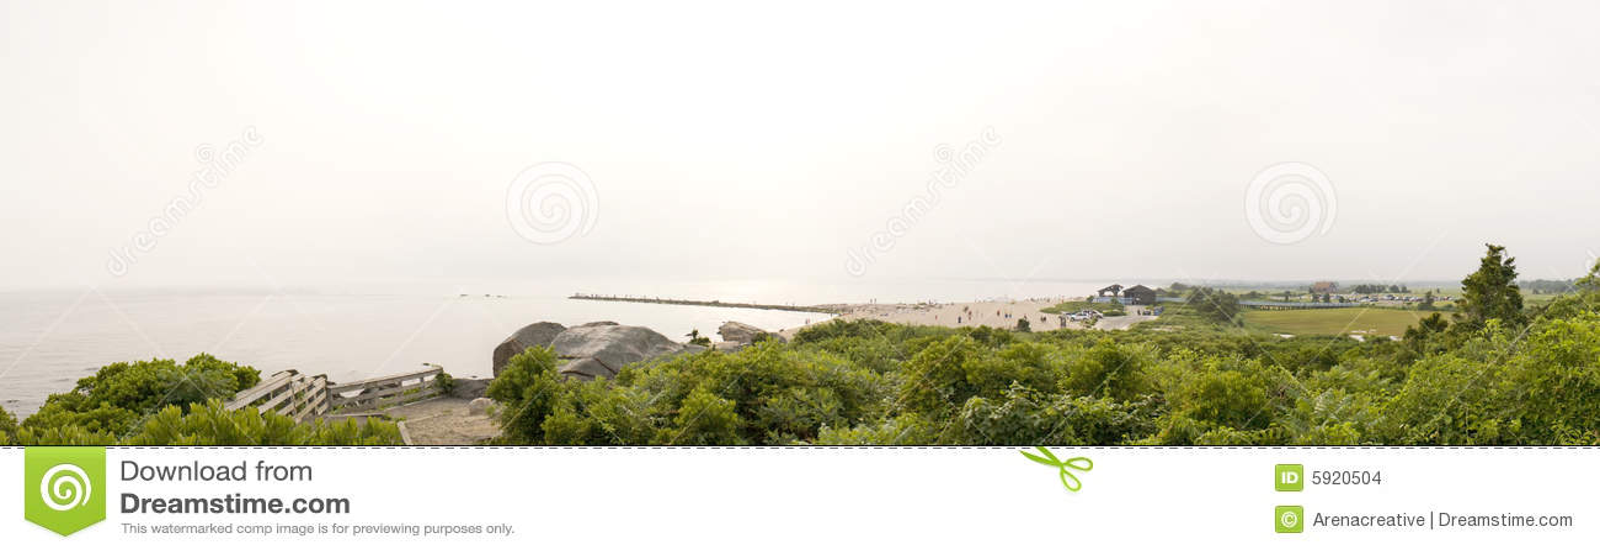 Connecticut-Strand-Panorama